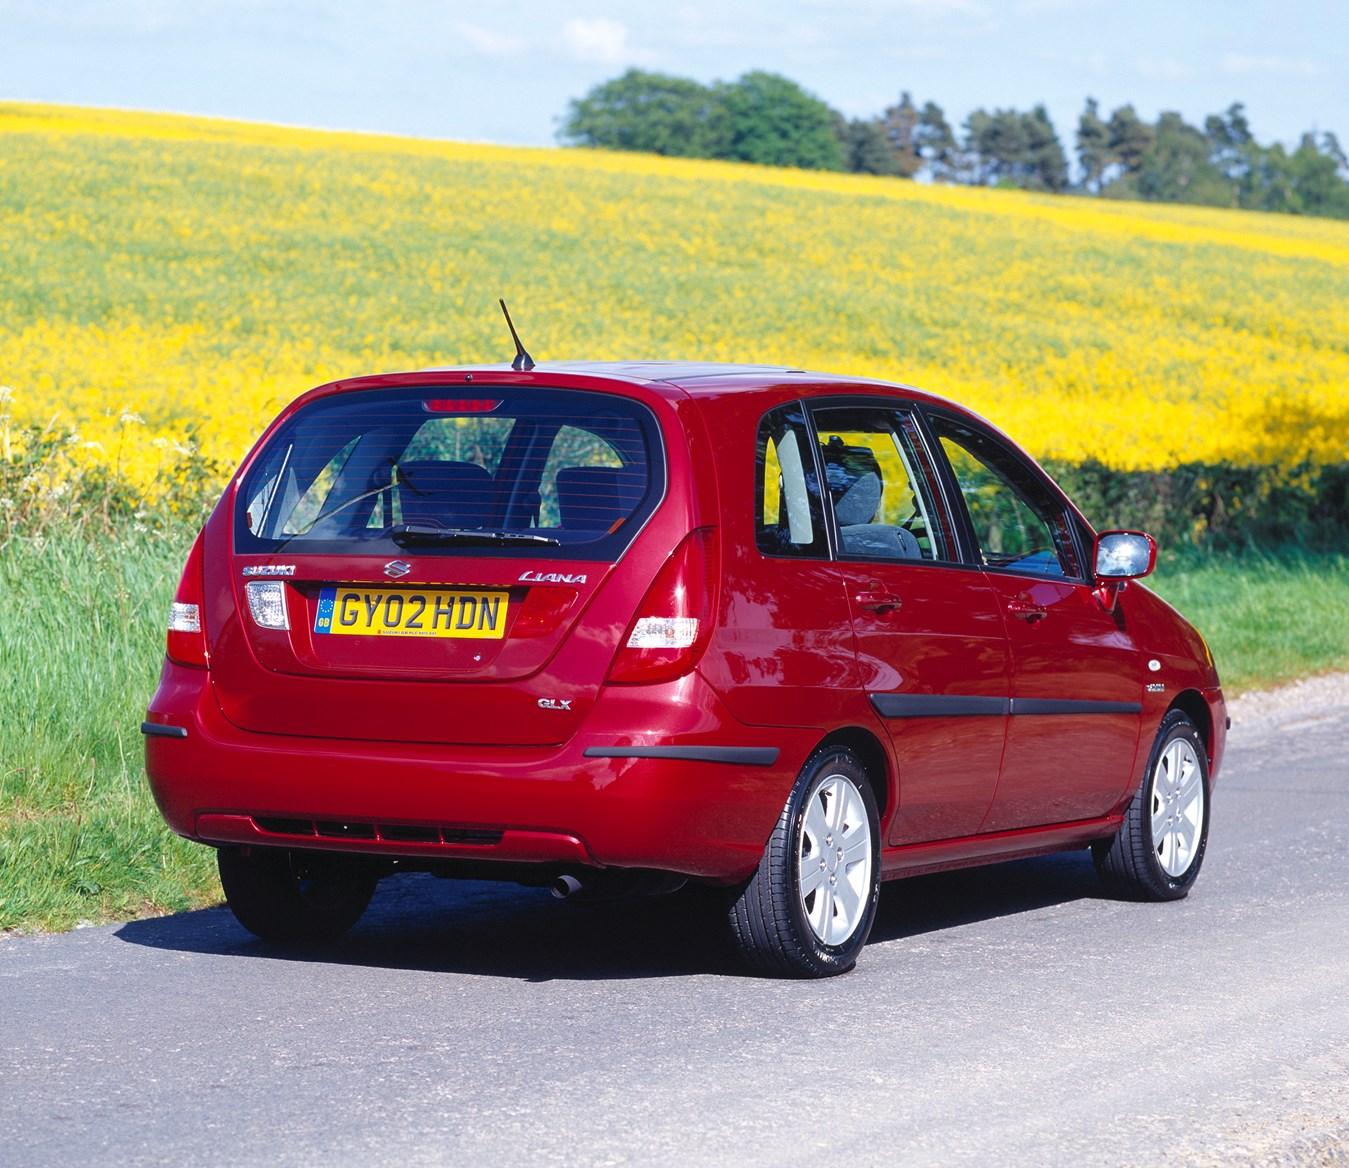 Suzuki Liana Hatchback Review (2001 - 2007)